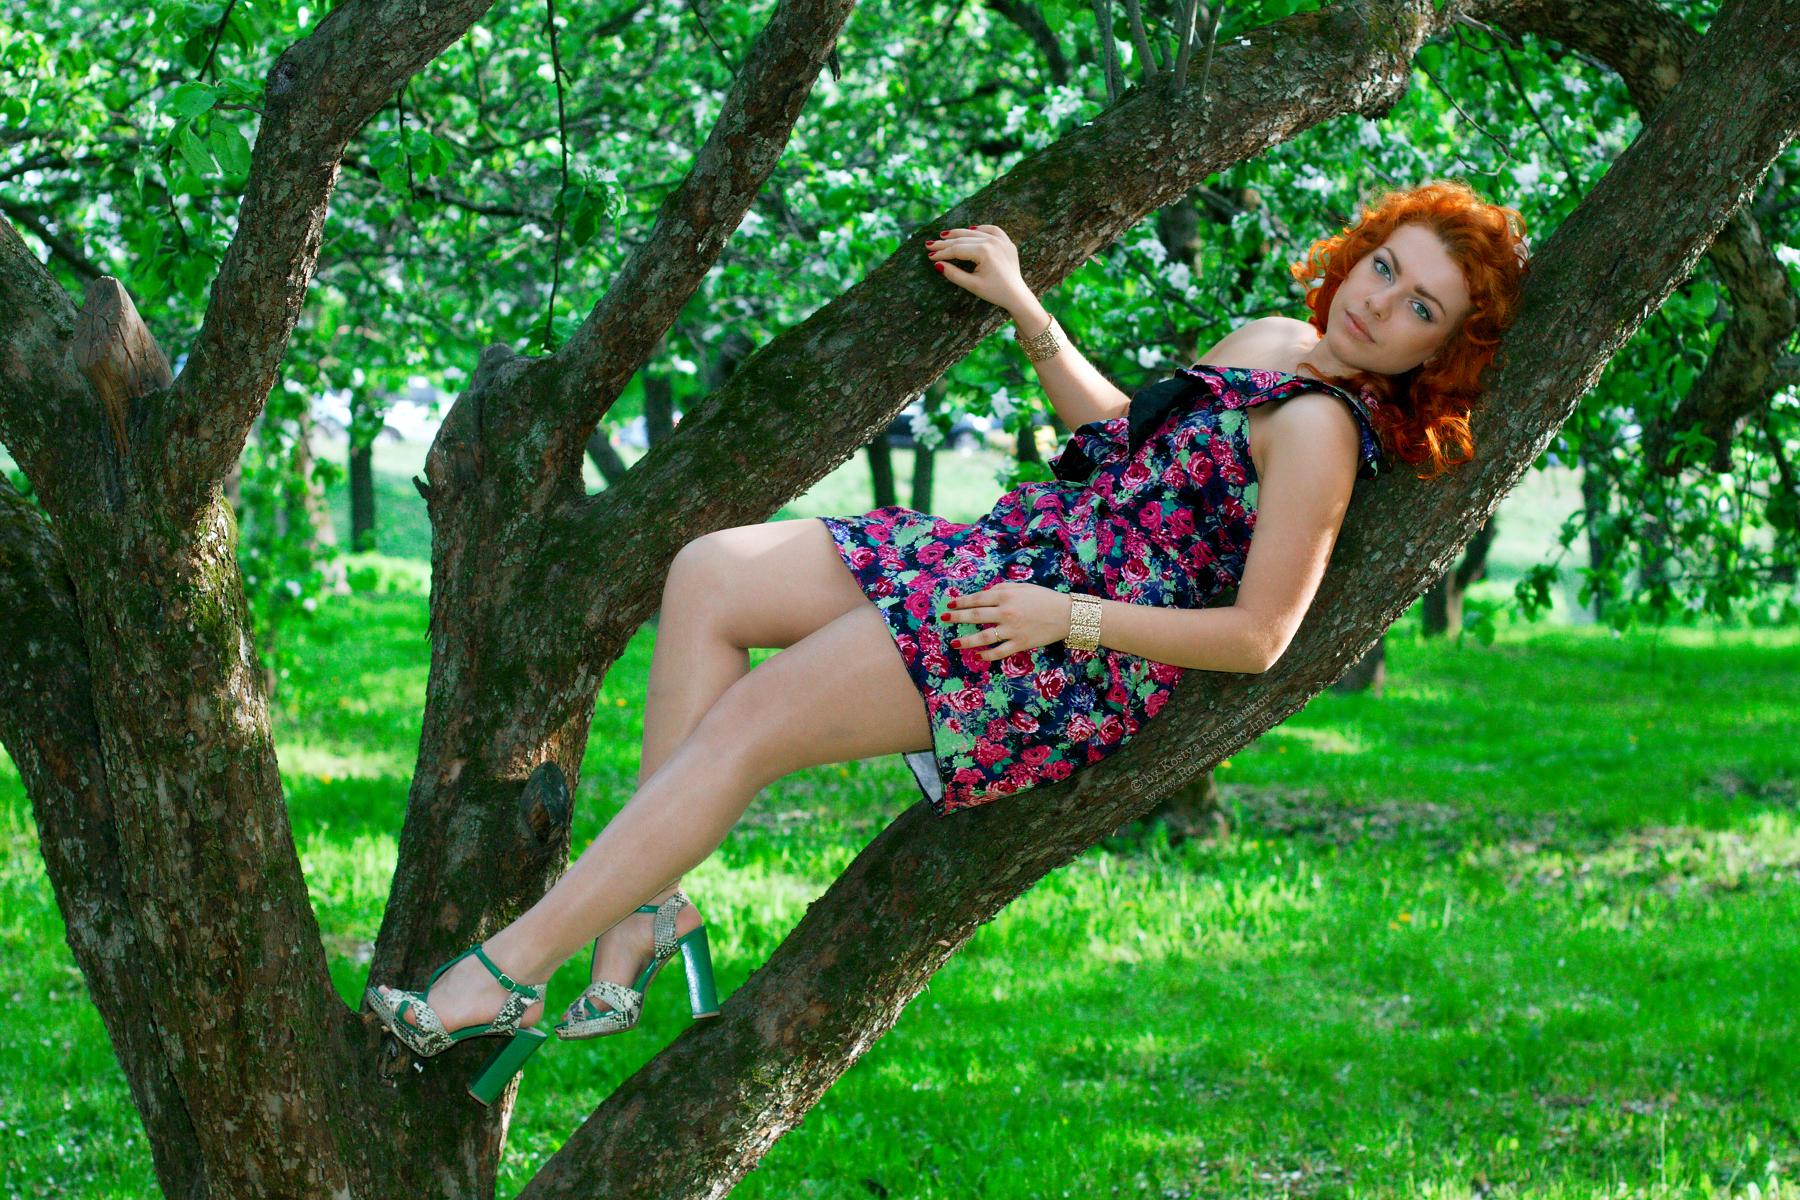 Russian girls pantyhose high heels